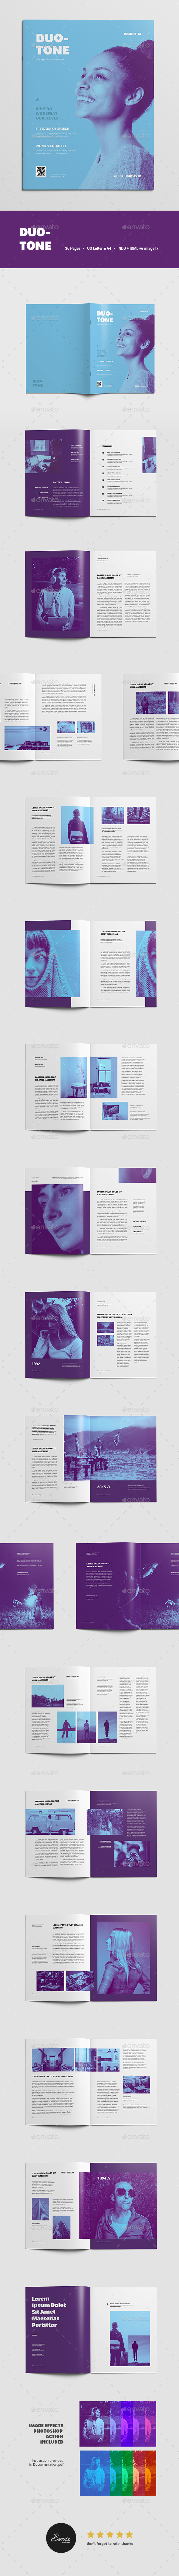 Duotone Magazine - Magazines Print Templates